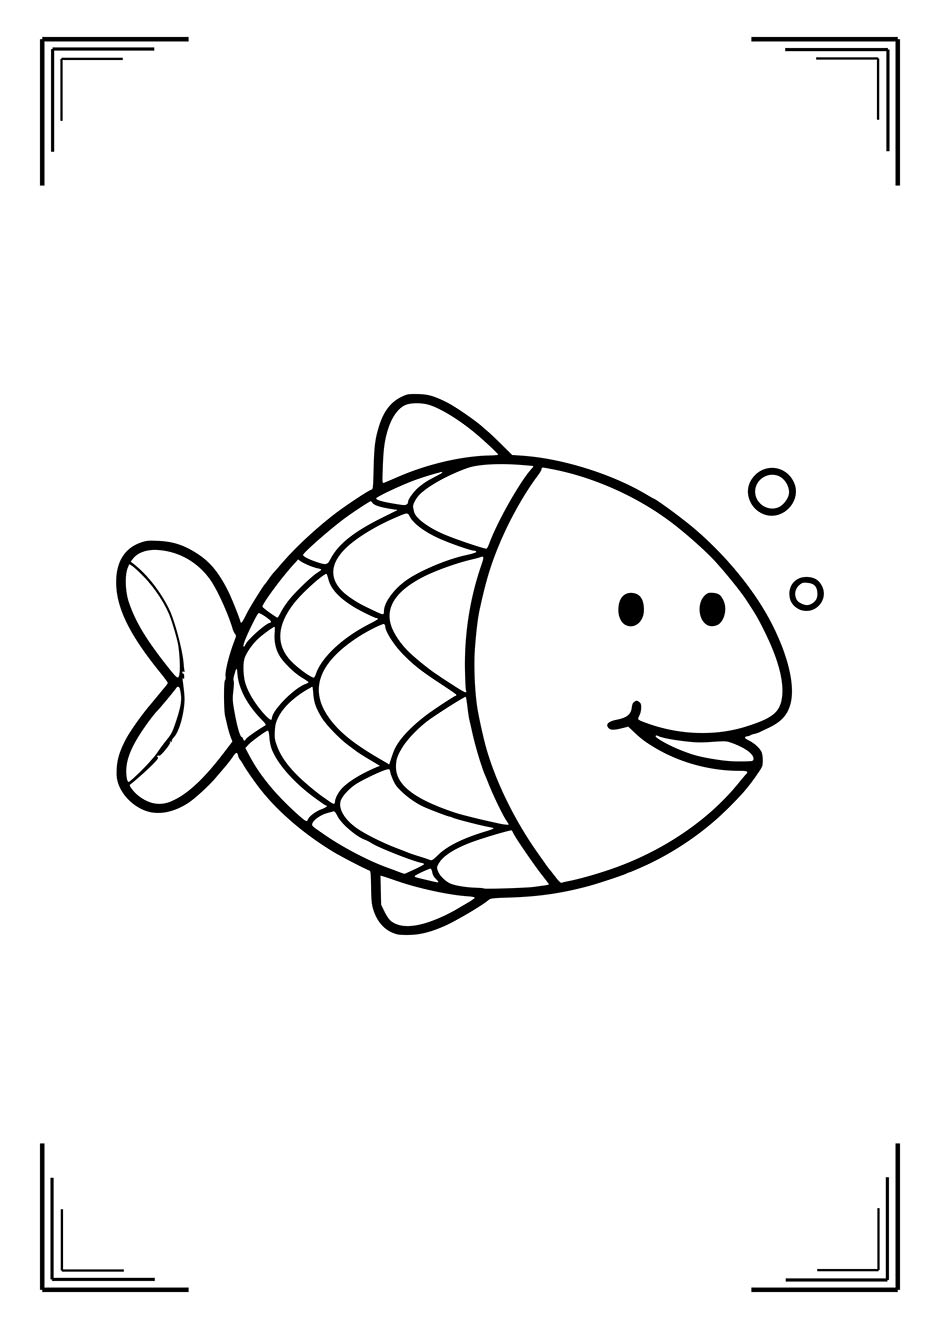 Раскраска: рыбка для самых маленьких – raskraski-a4.ru